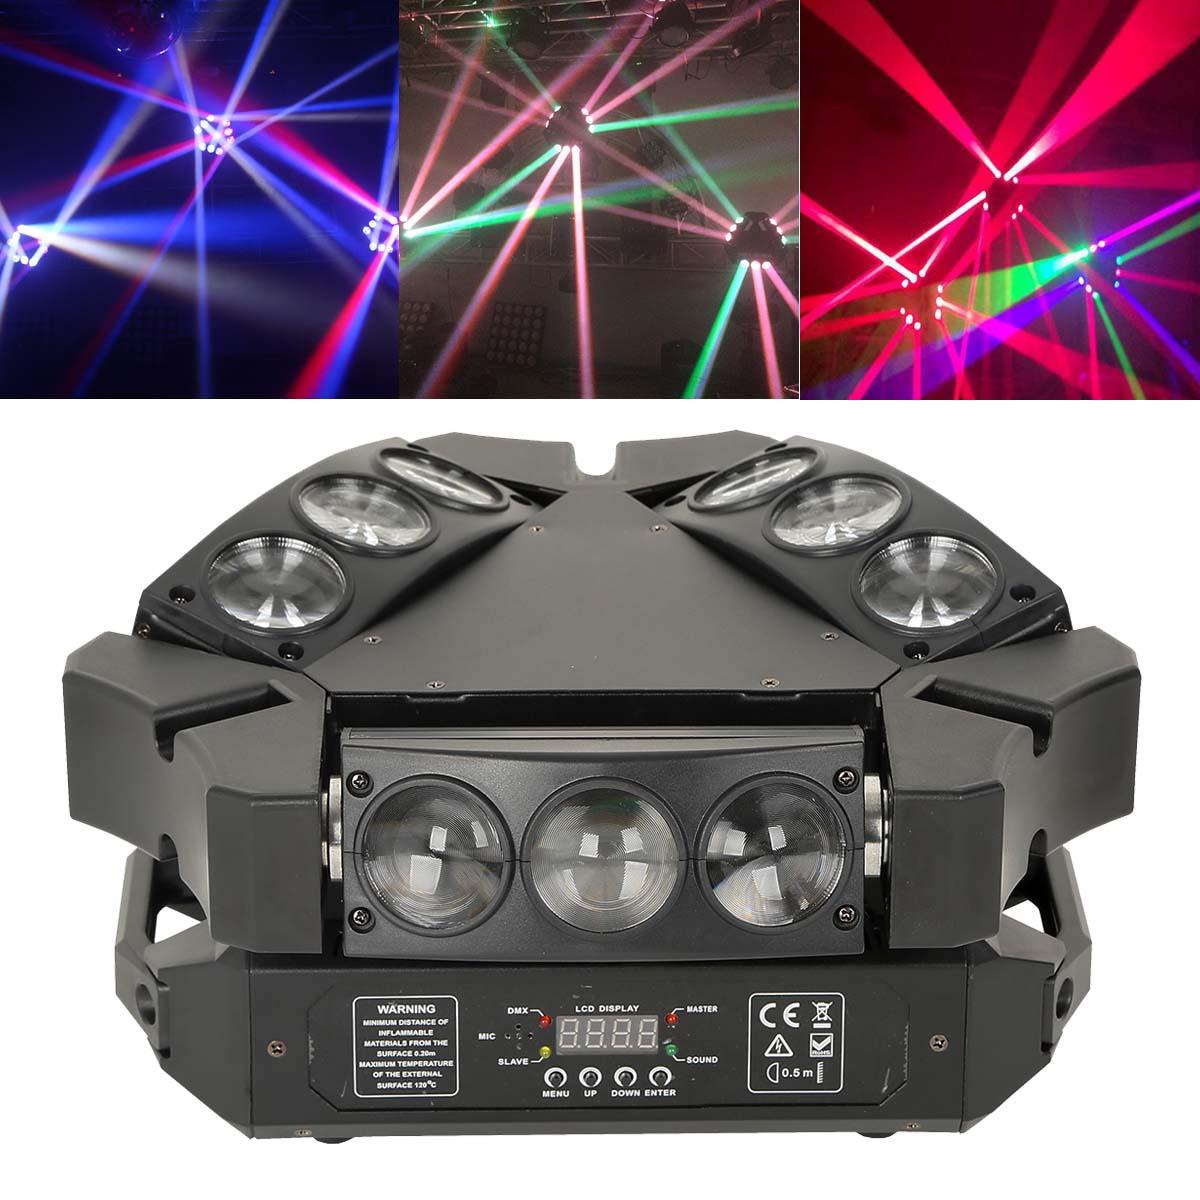 9x3w rgb dmx led spider moving head light stage bar ktv dj disco lighting ebay. Black Bedroom Furniture Sets. Home Design Ideas